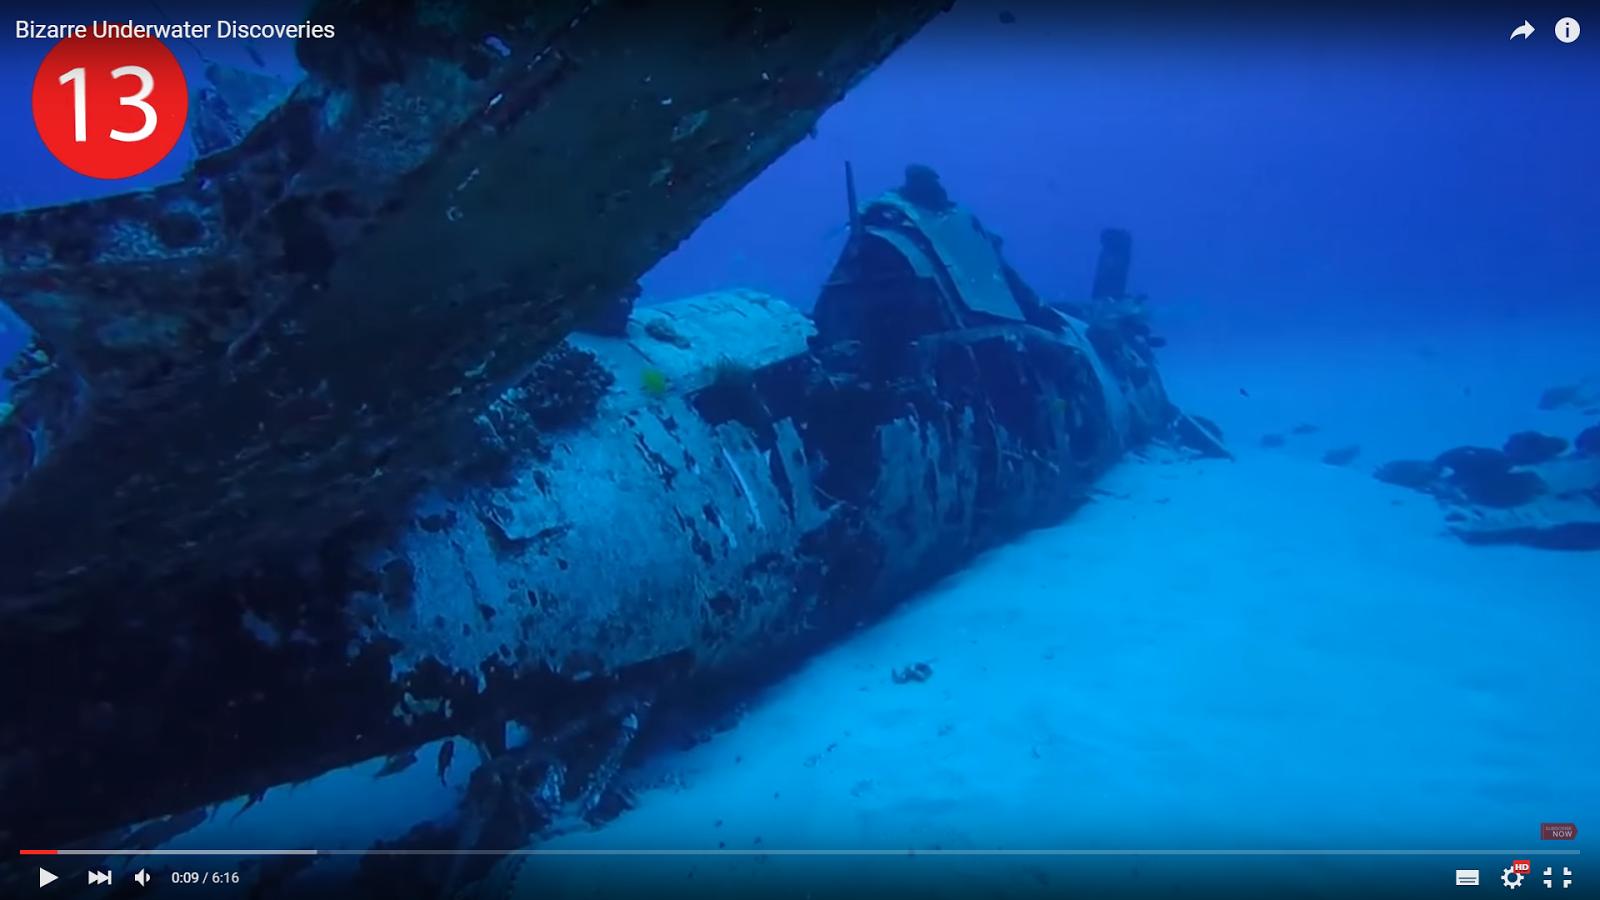 VIDEO Amp GALLERY 13 Bizarre Underwater Discoveries